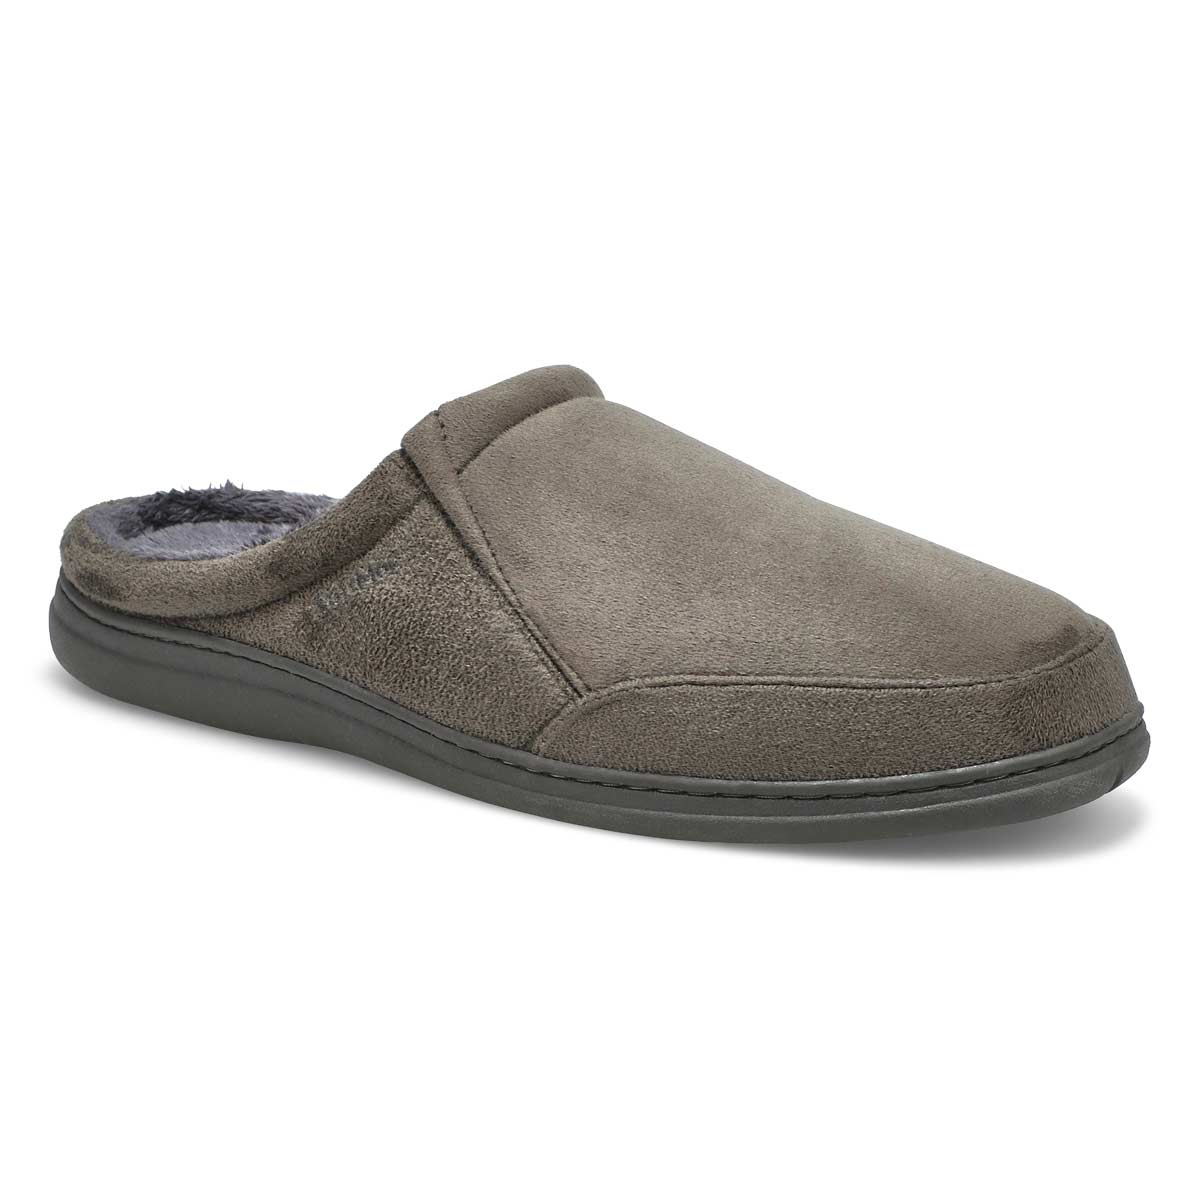 Mns Polar II charcoal open back slipper